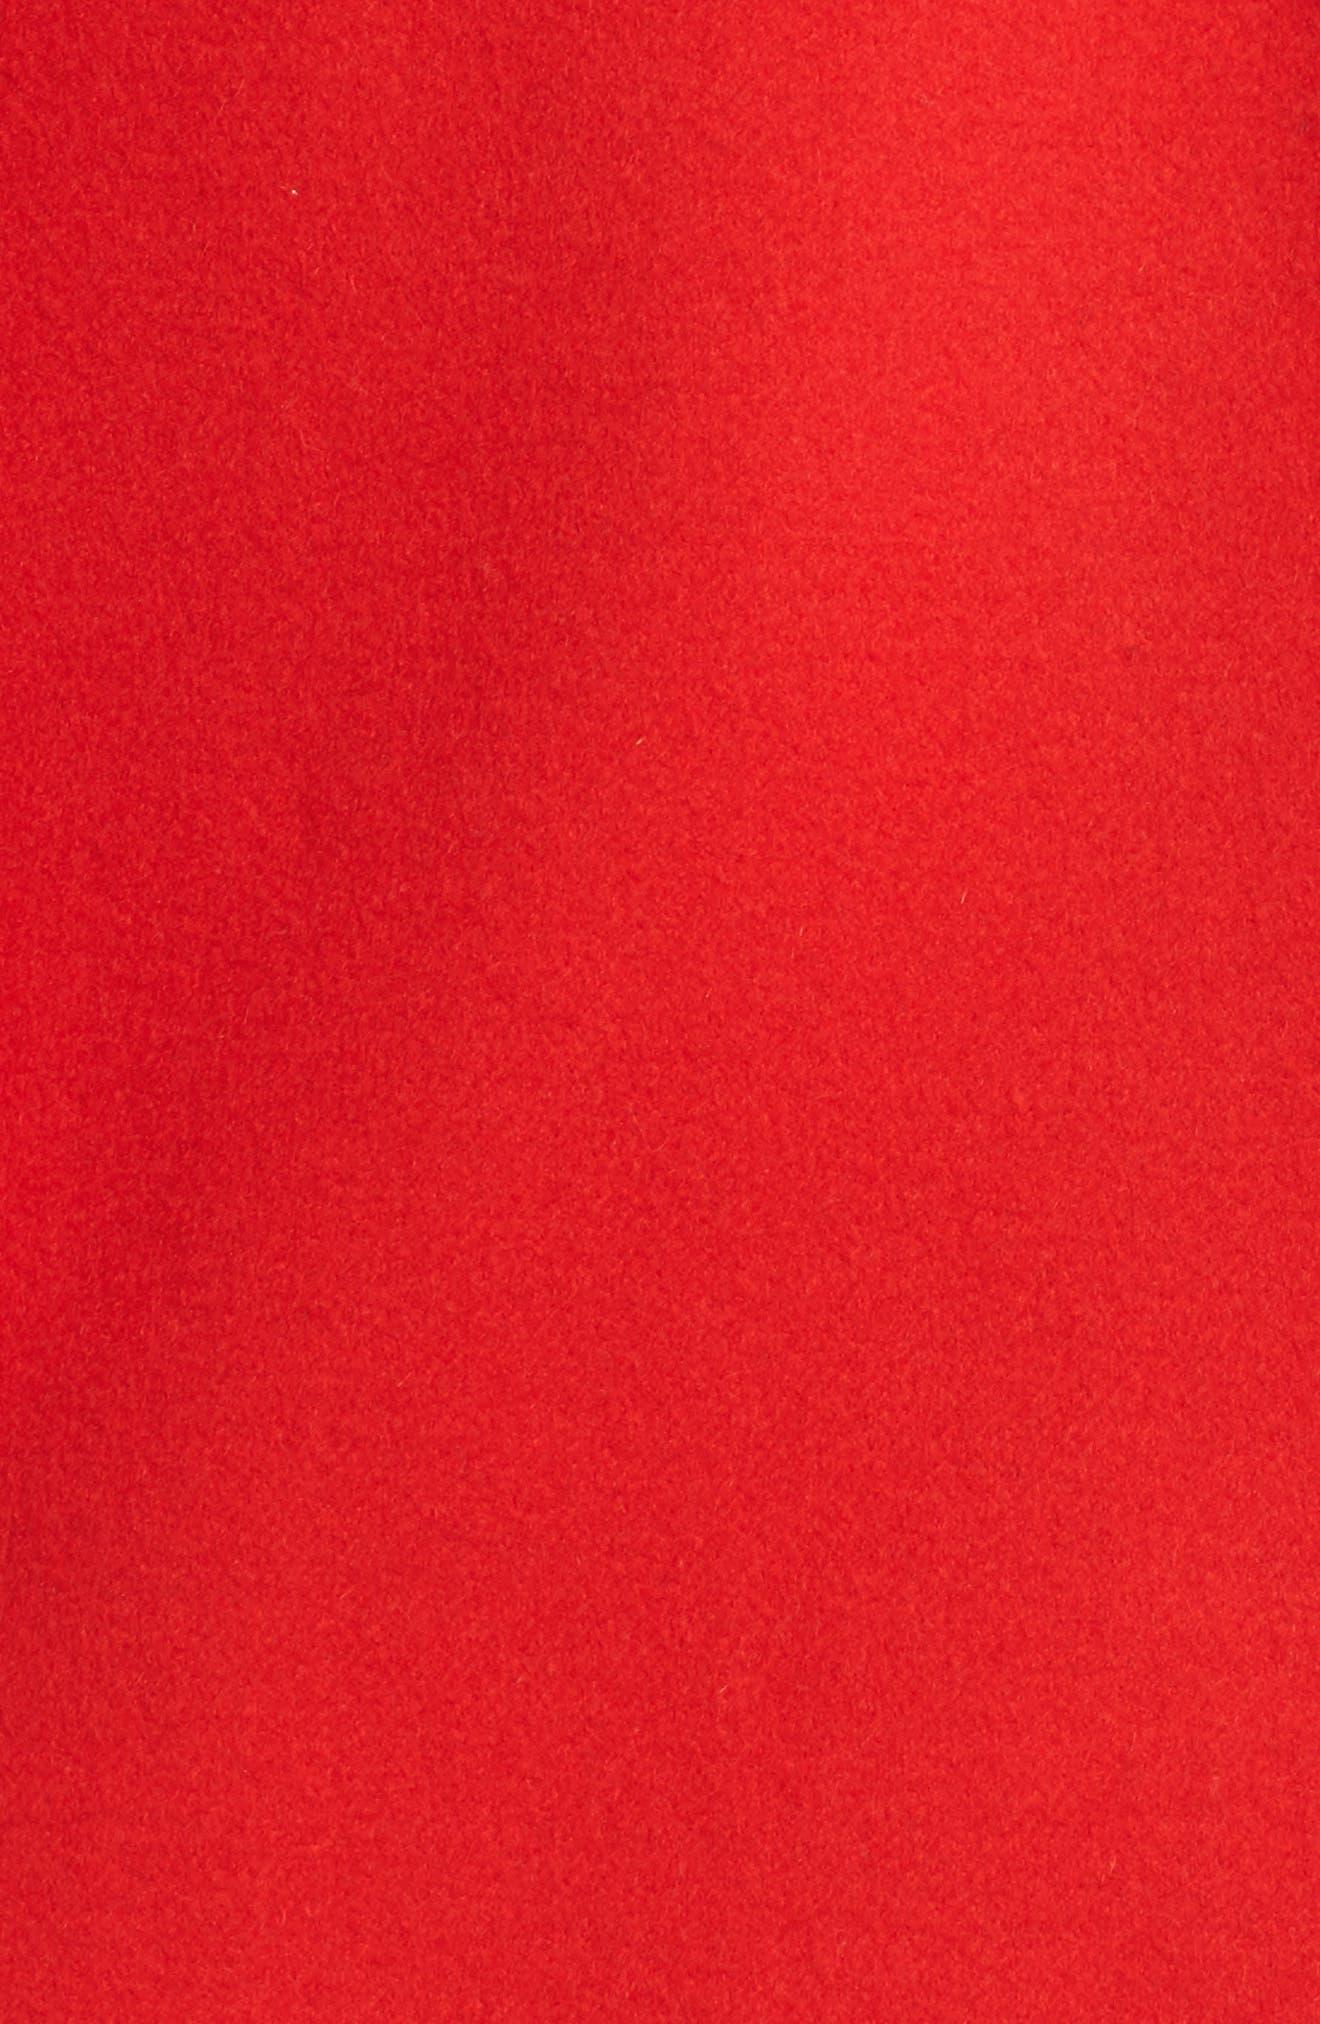 DIANE VON FURSTENBERG,                             Double Face Wool Blend Walker,                             Alternate thumbnail 6, color,                             608